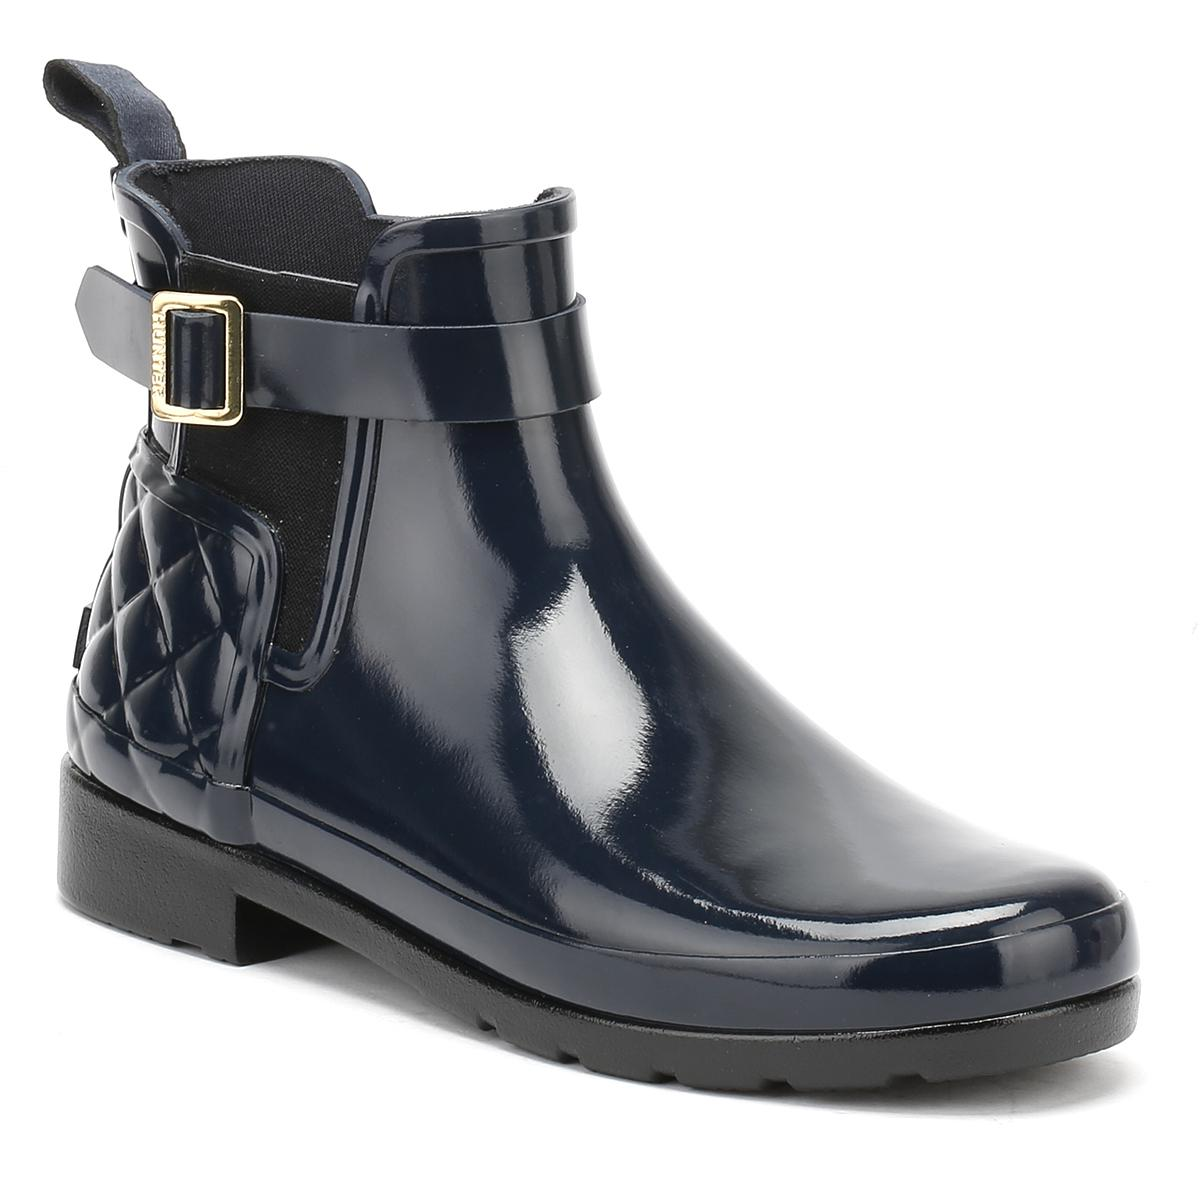 3cf34b460d8 HUNTER. Blue Original Womens Refined Gloss Quilted Navy Chelsea Boots